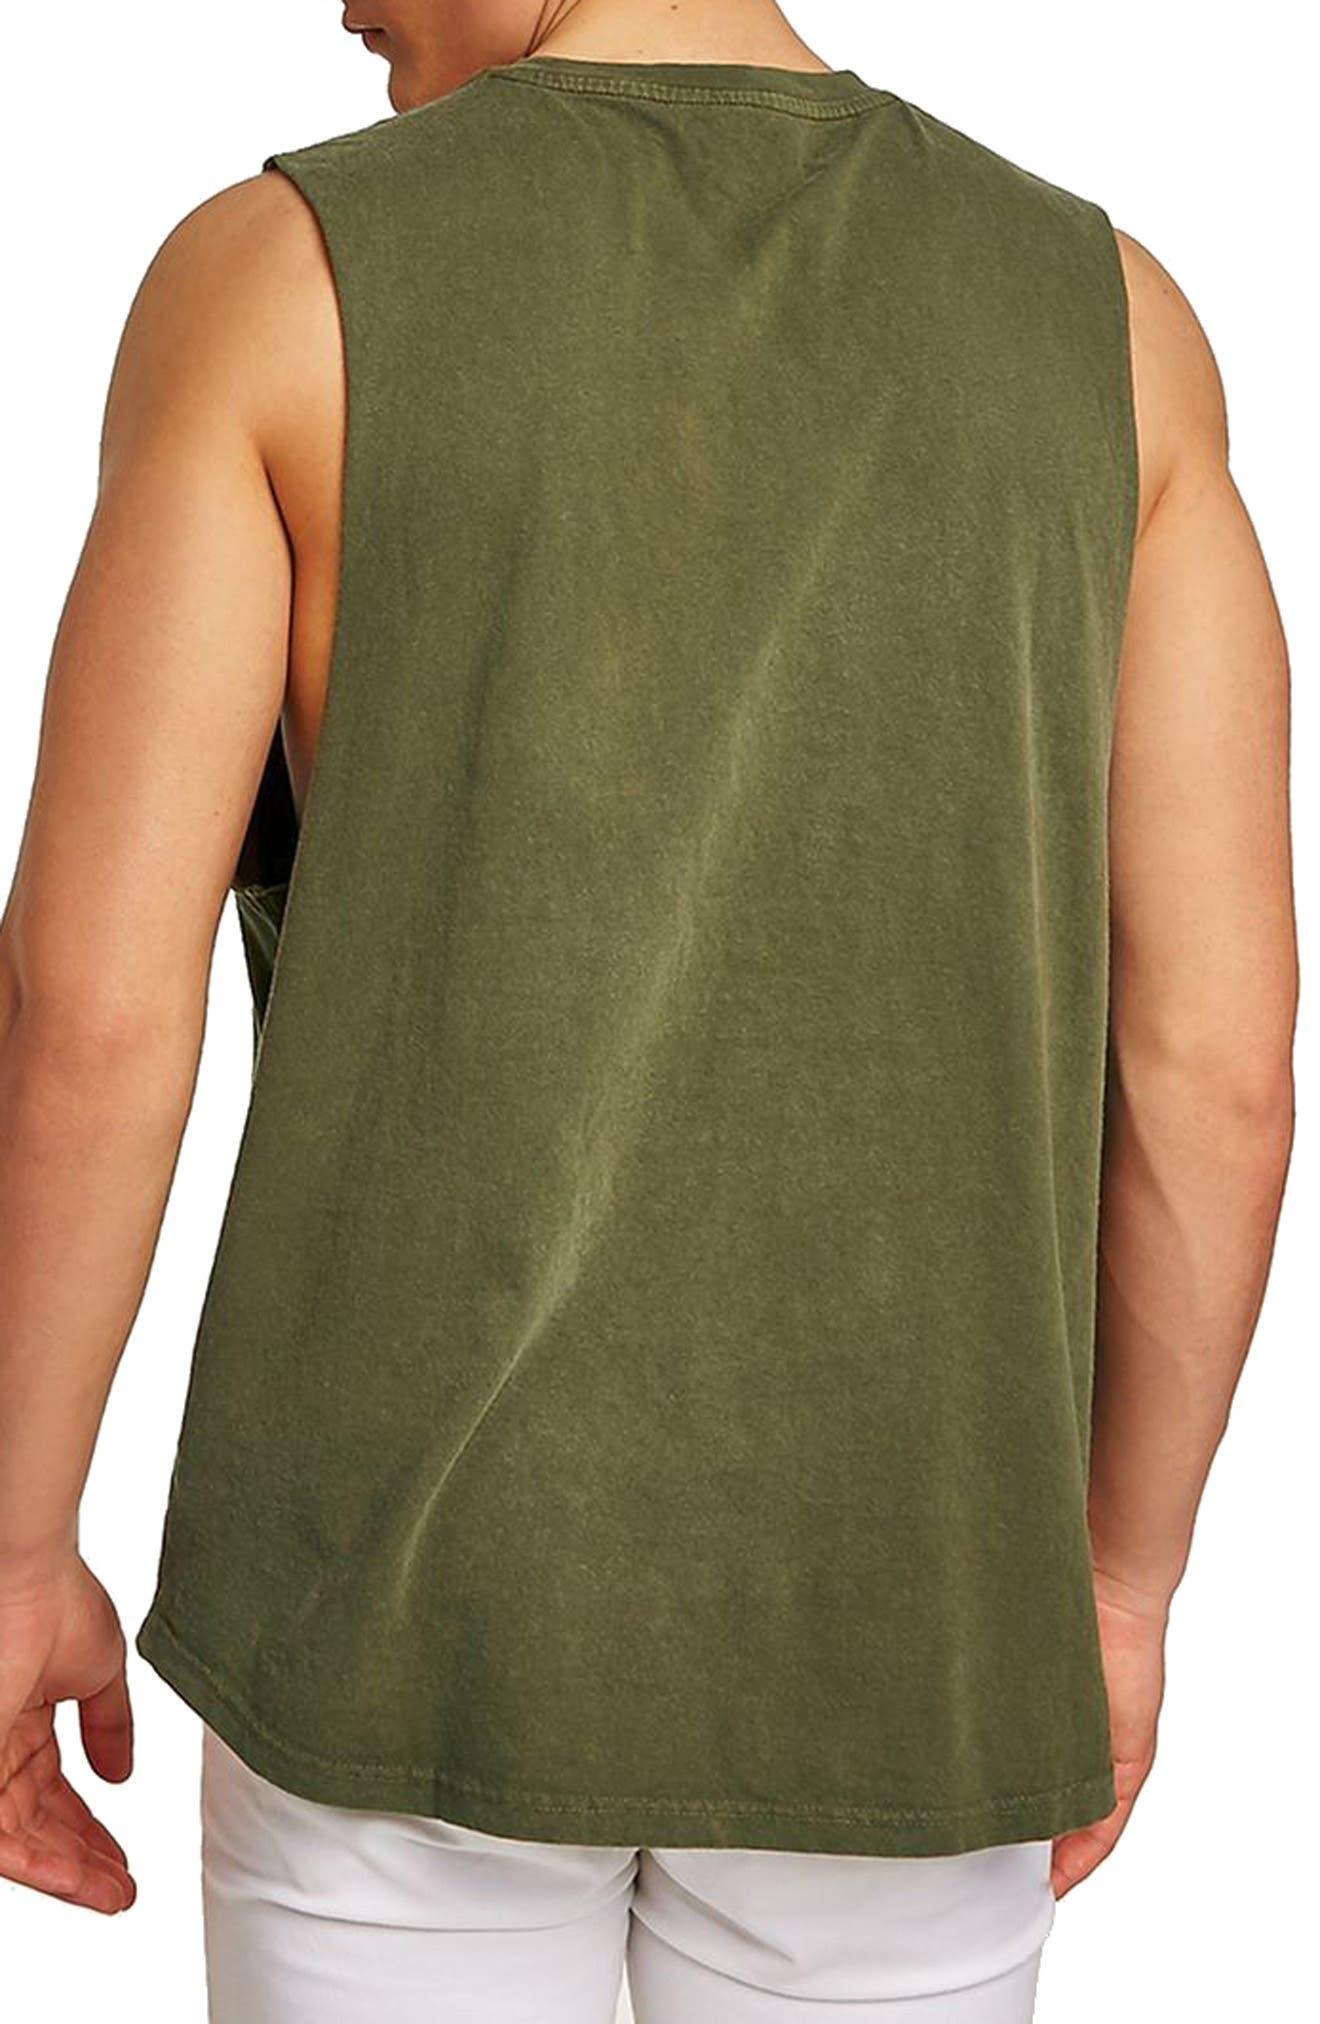 Drop Shoulder Tank,                             Alternate thumbnail 2, color,                             301